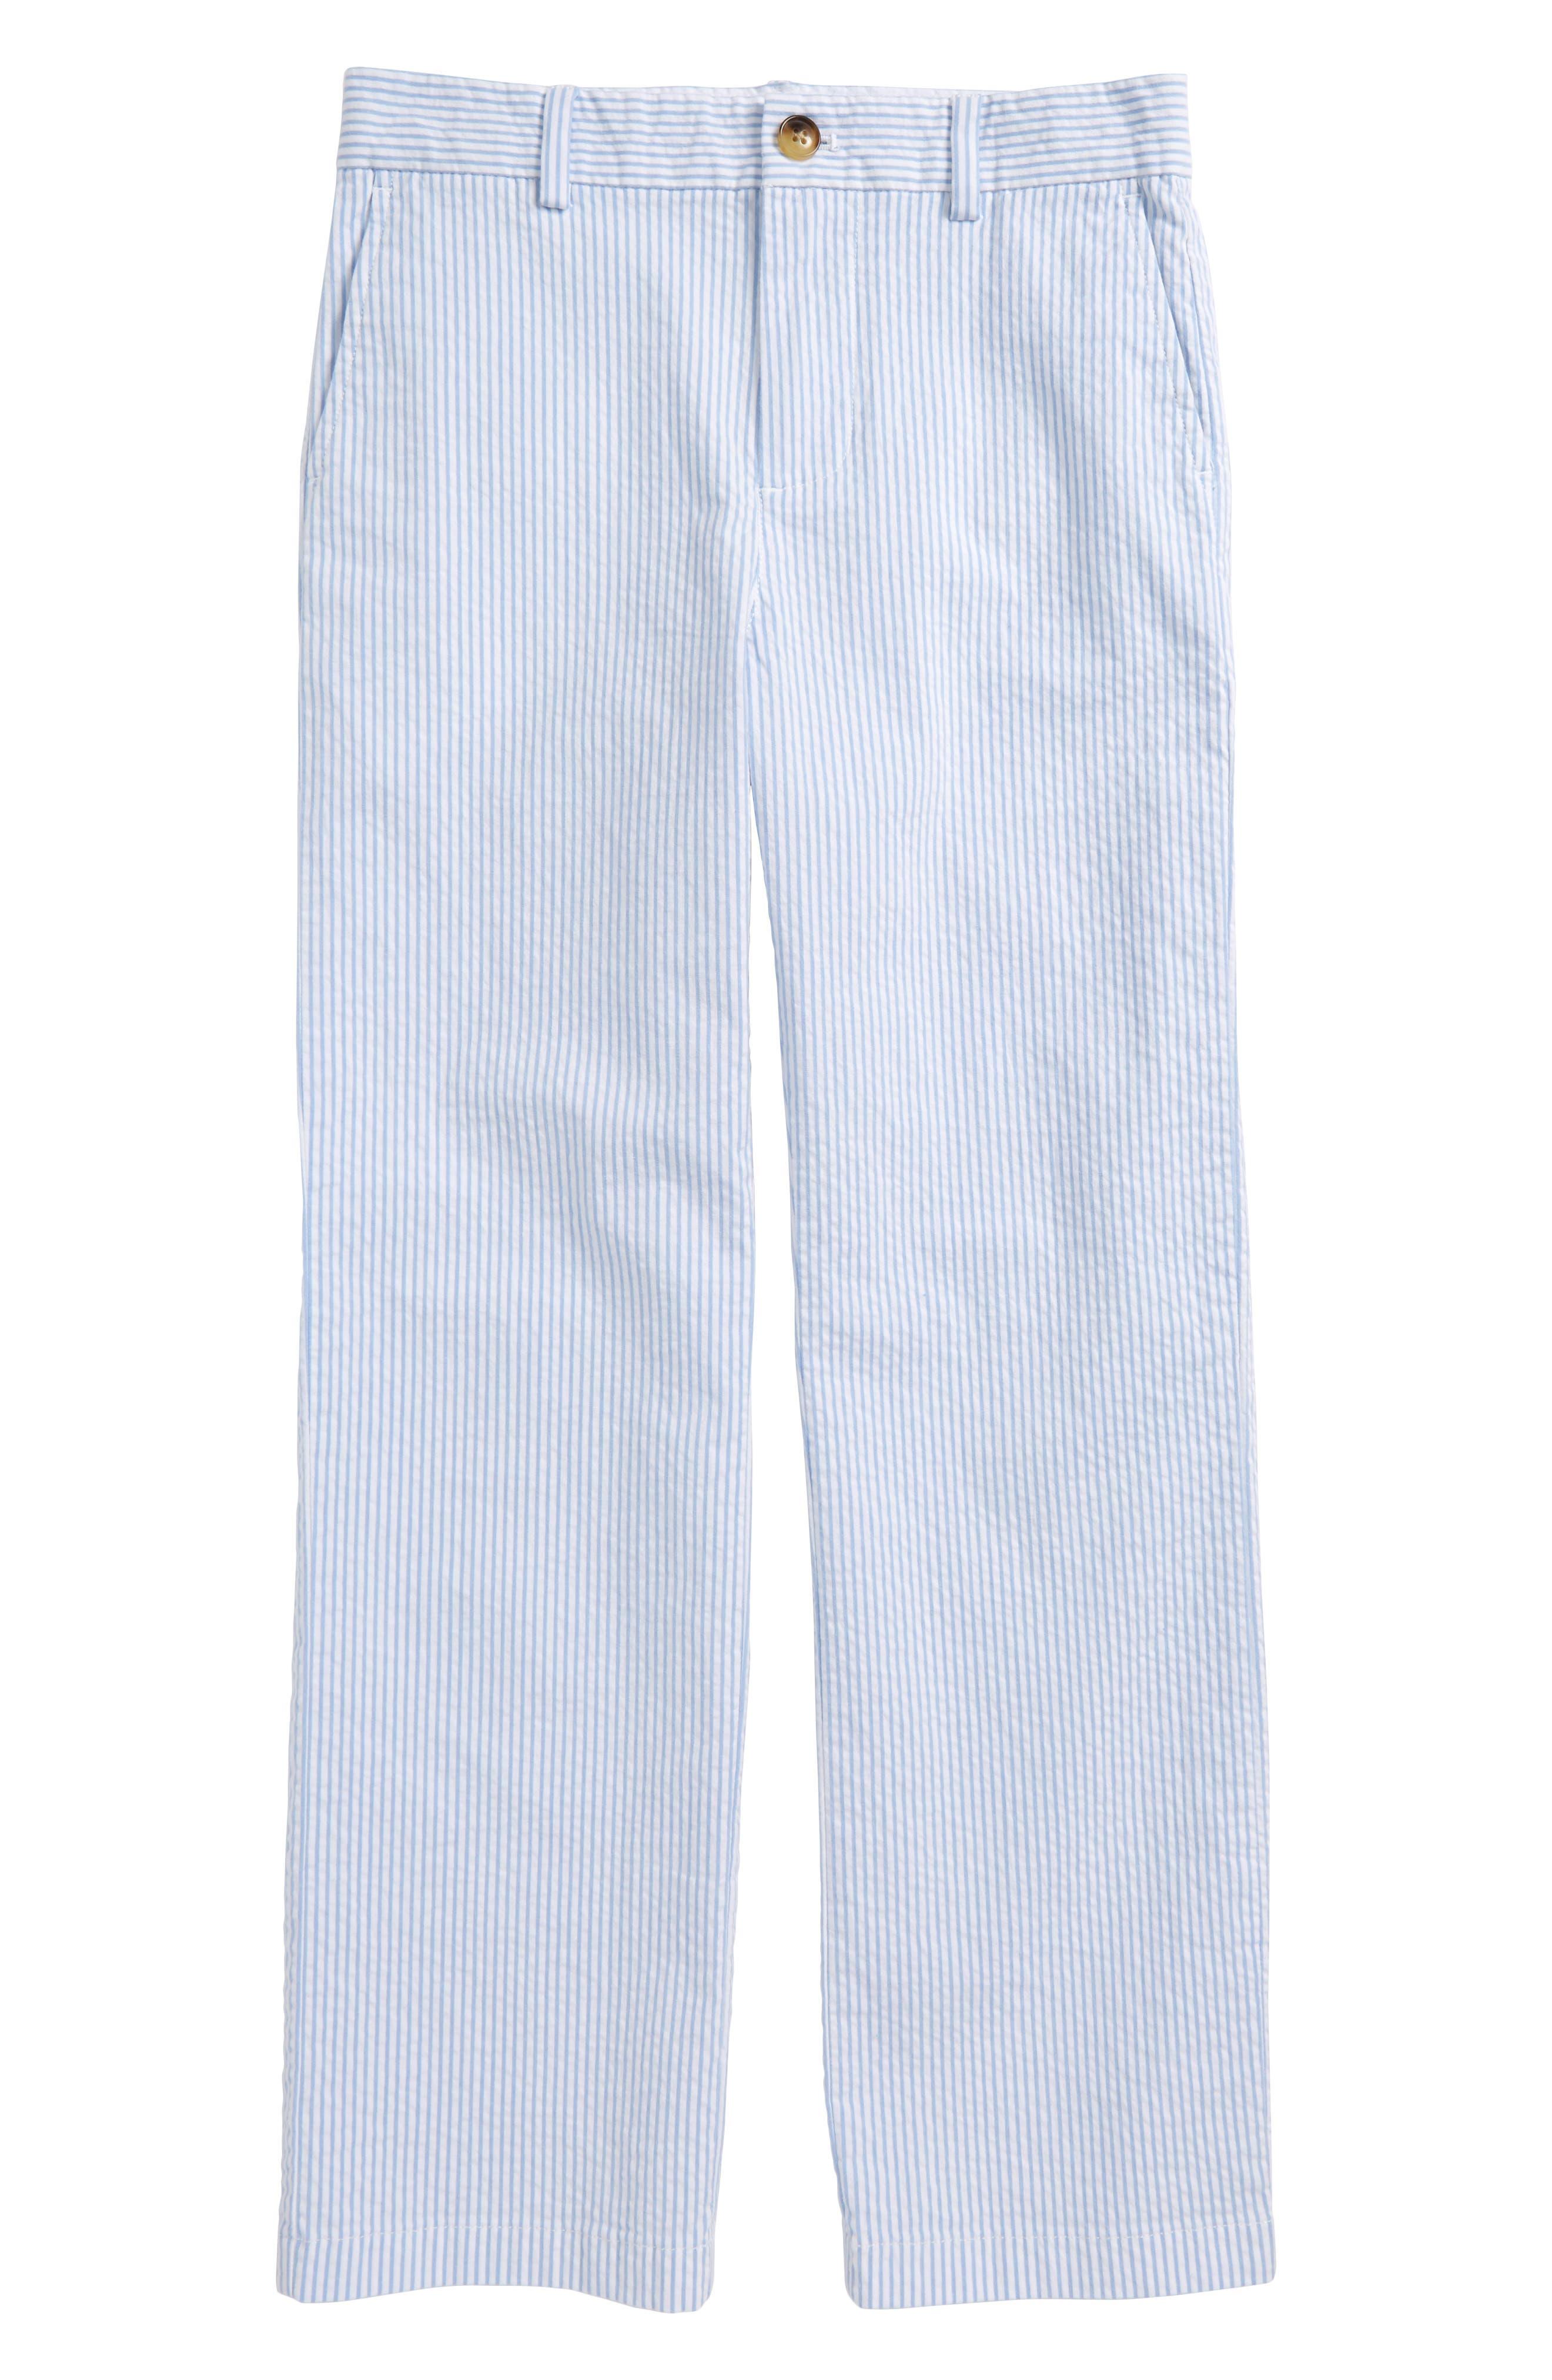 Seersucker Stripe Breaker Pants,                         Main,                         color, 484